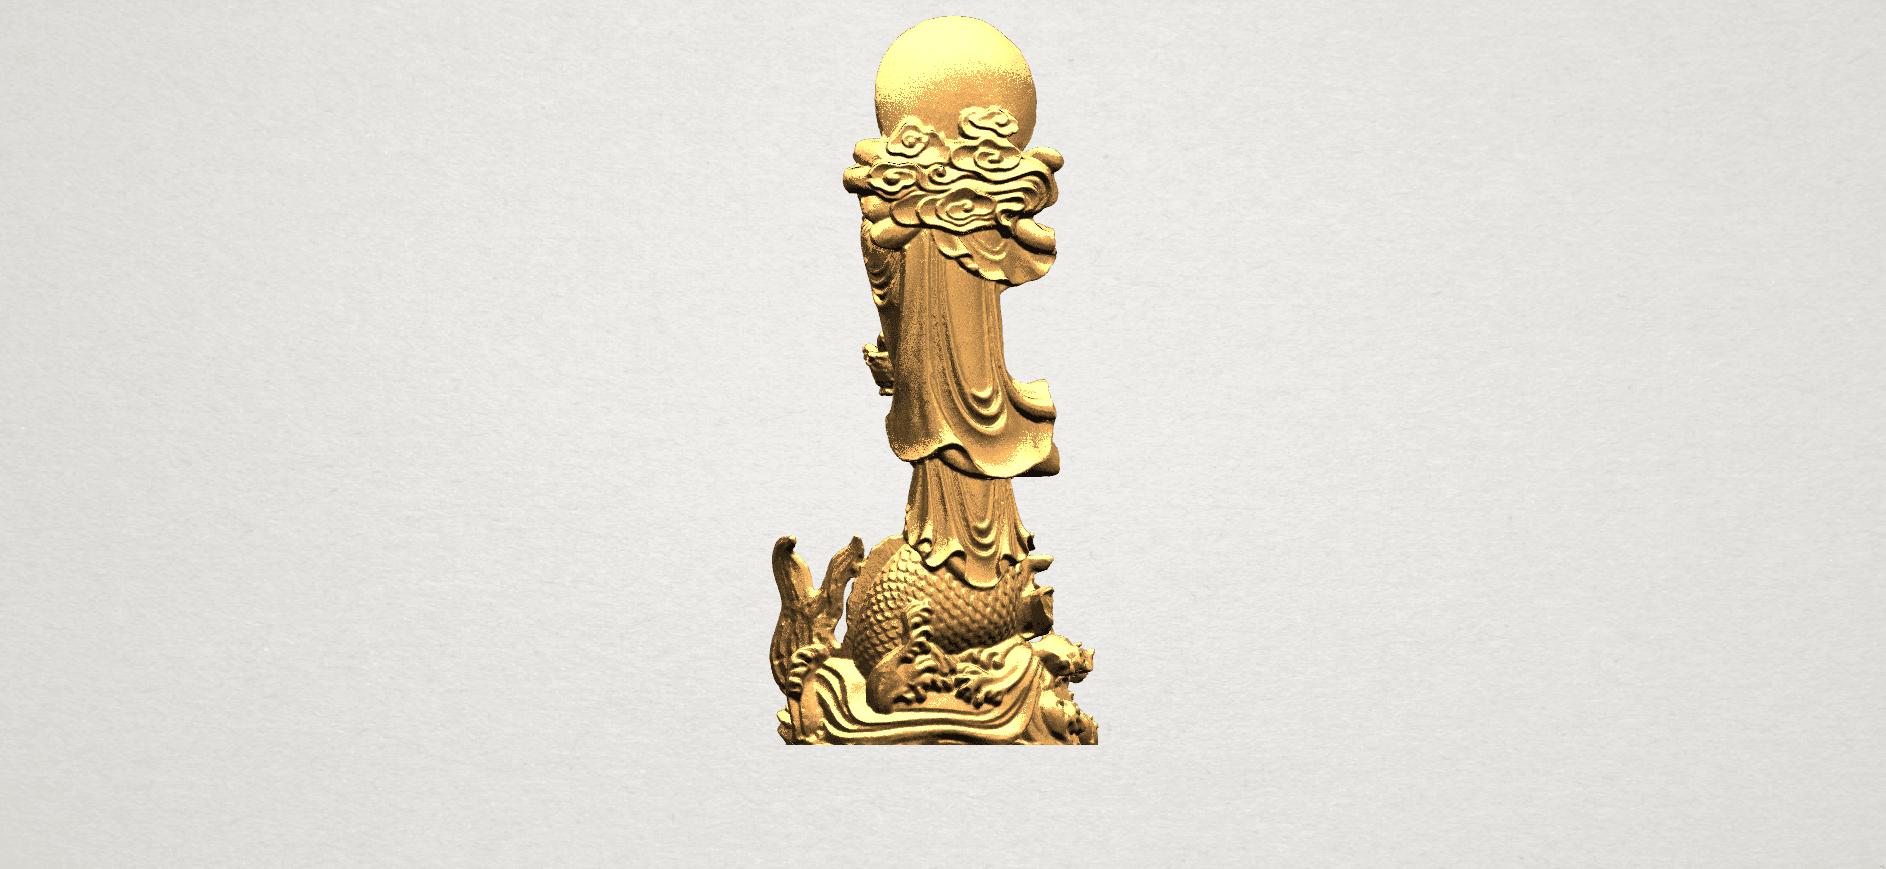 Avalokitesvara Buddha  (with fish) (ii) A05.png Download free STL file Avalokitesvara Bodhisattva (with fish) 02 • 3D printer template, GeorgesNikkei